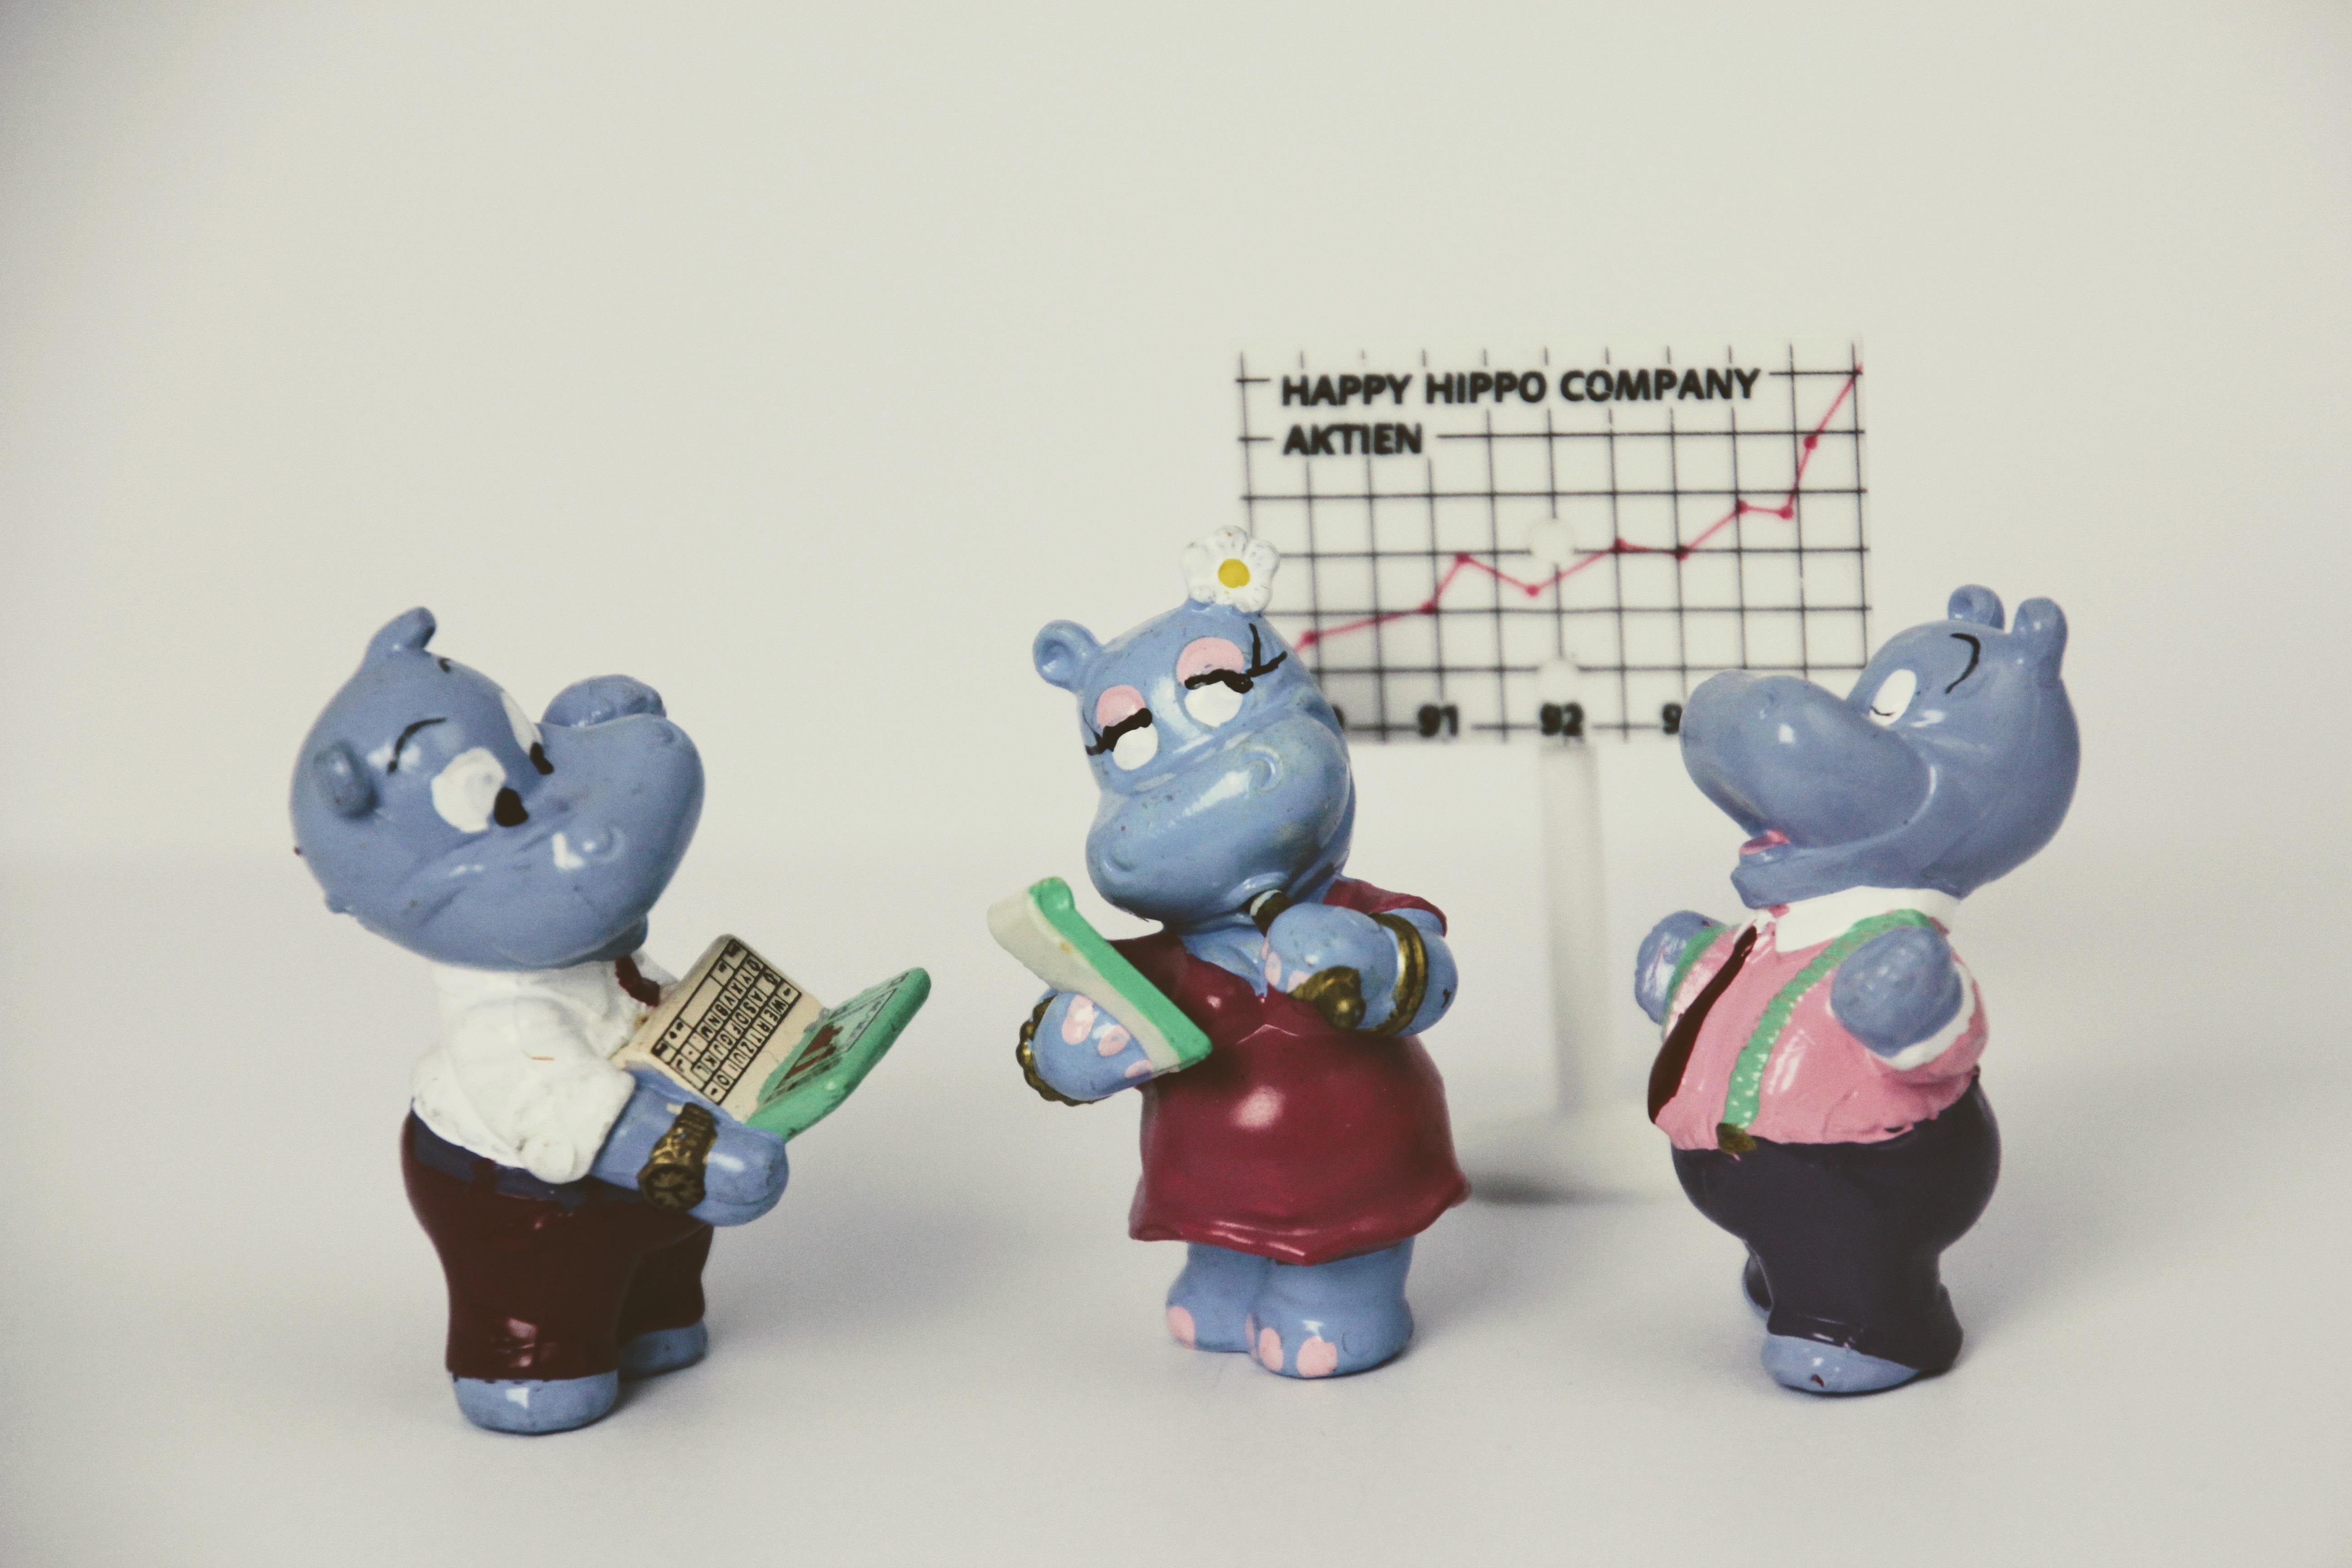 Gambar Pertemuan Koleksi Kantor Biru Mainan Produk Seni